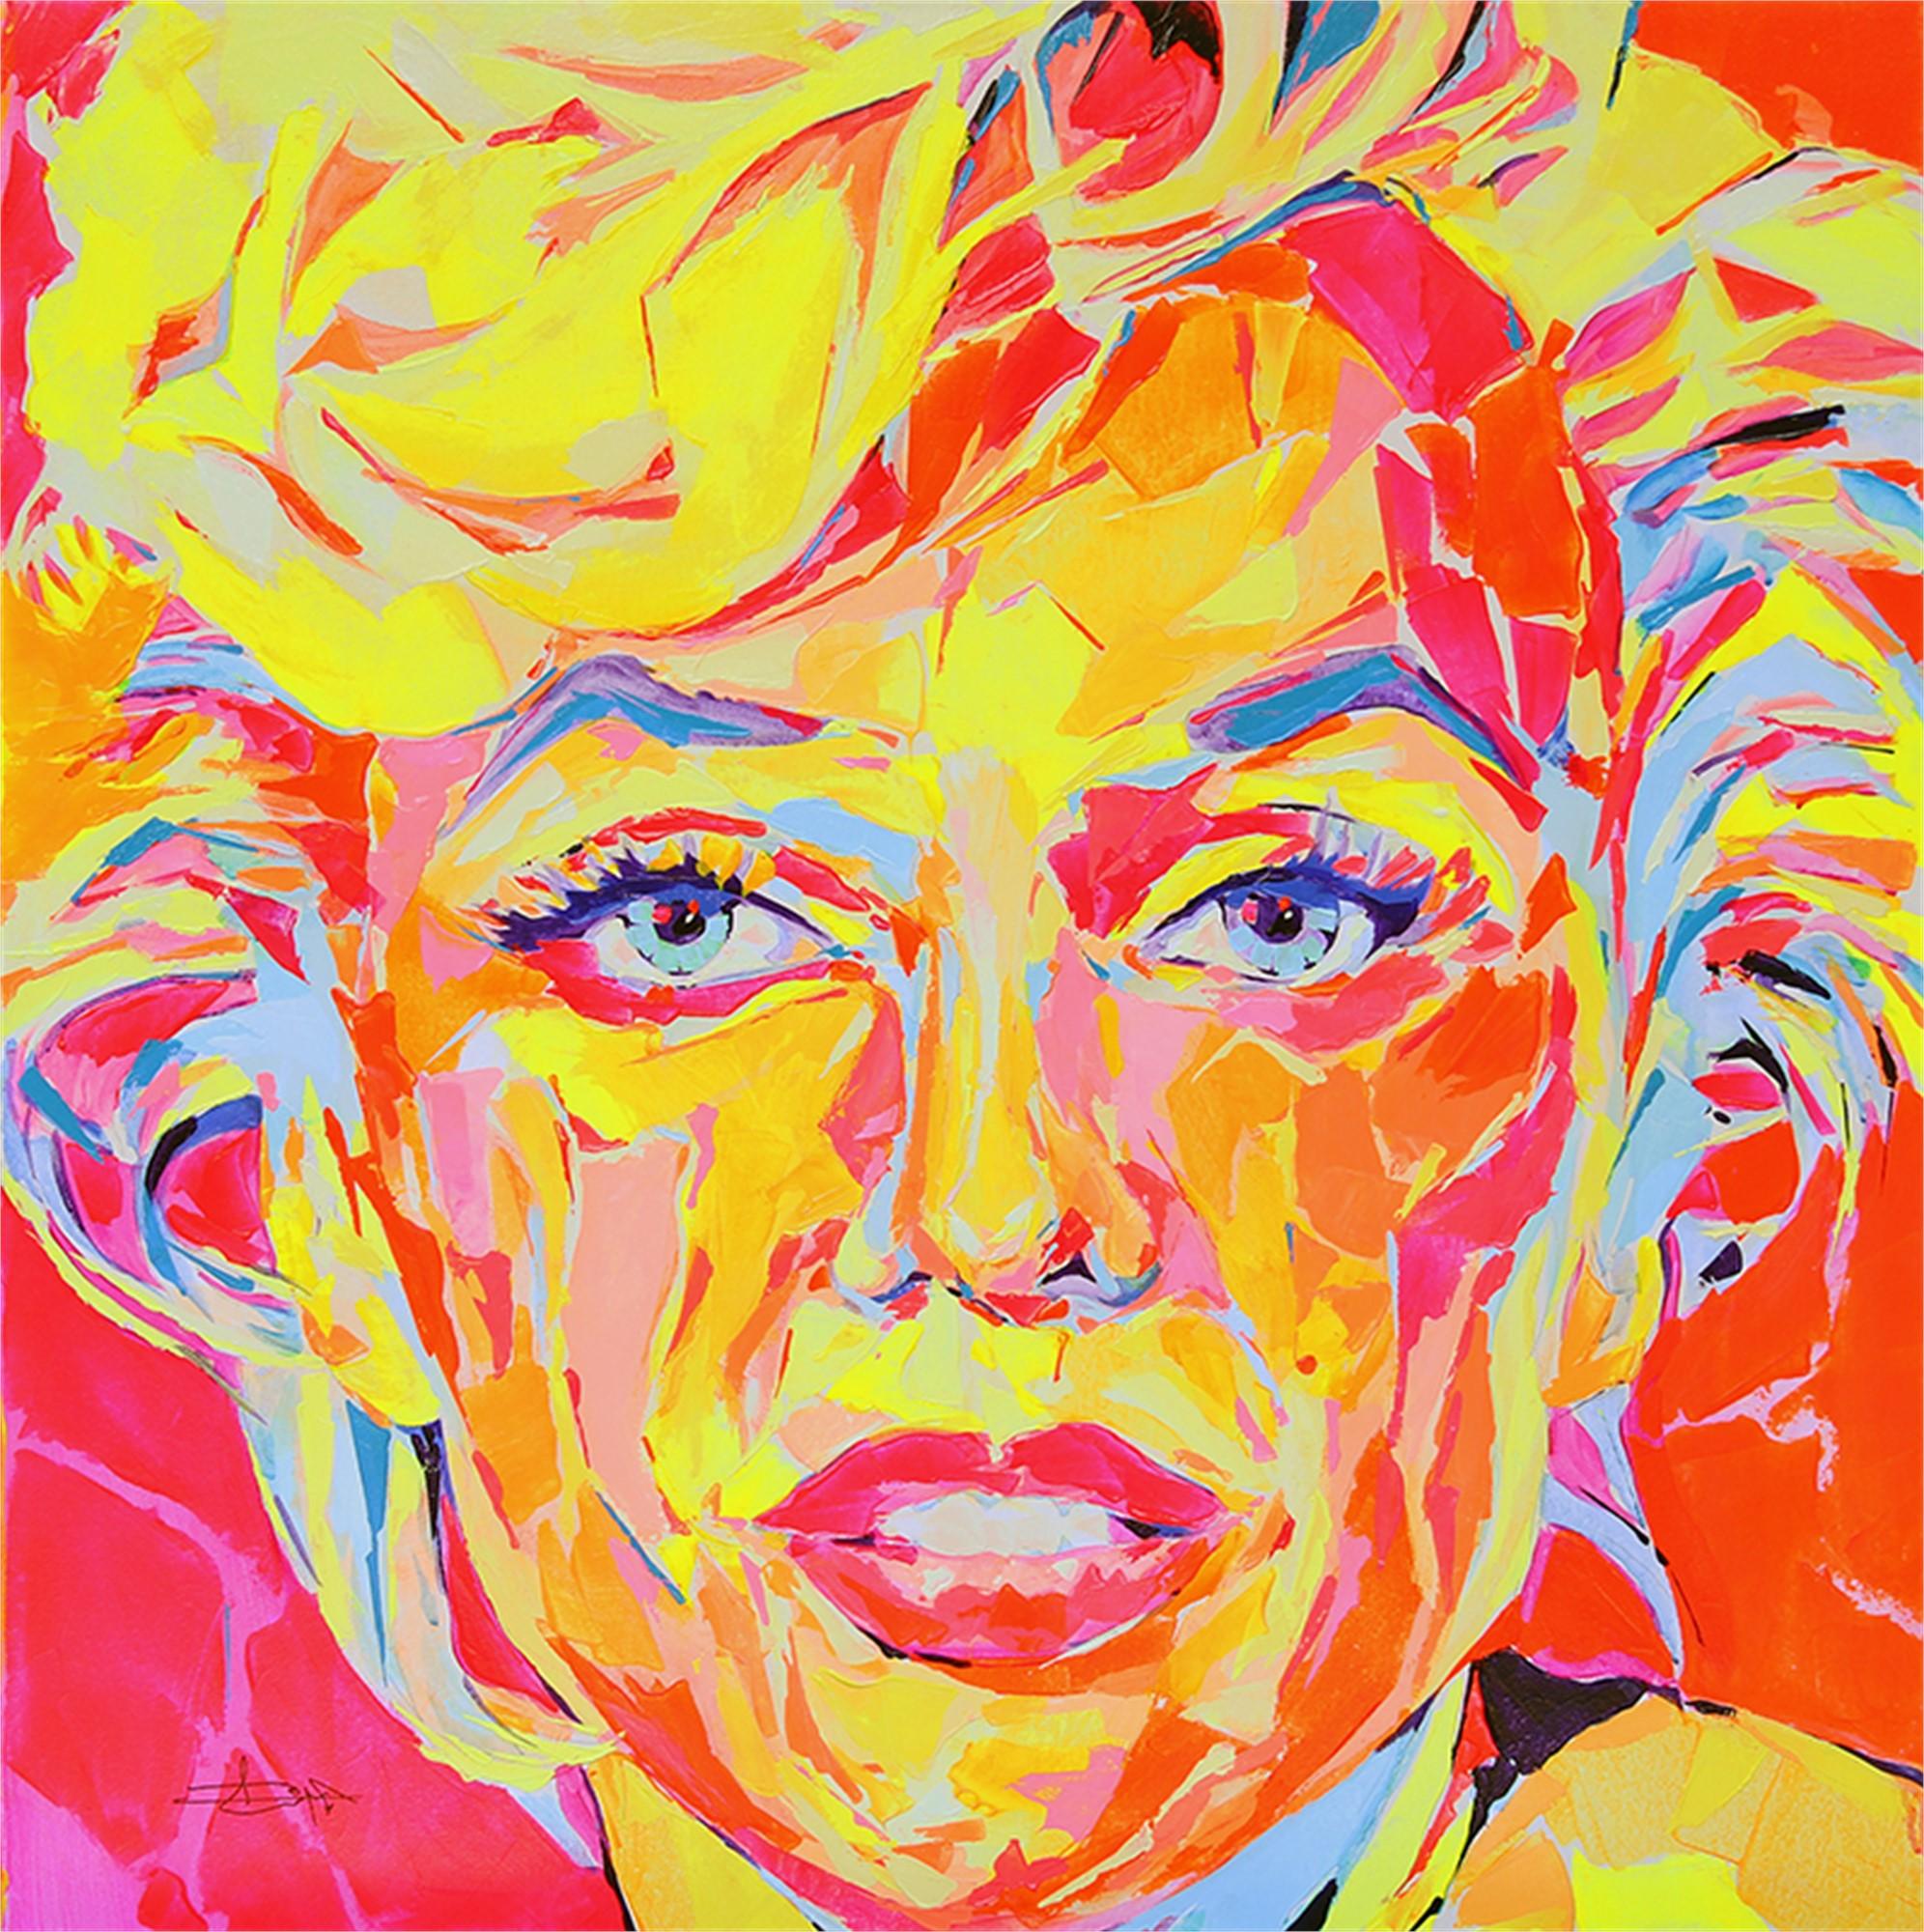 Marilyn Monroe&#39